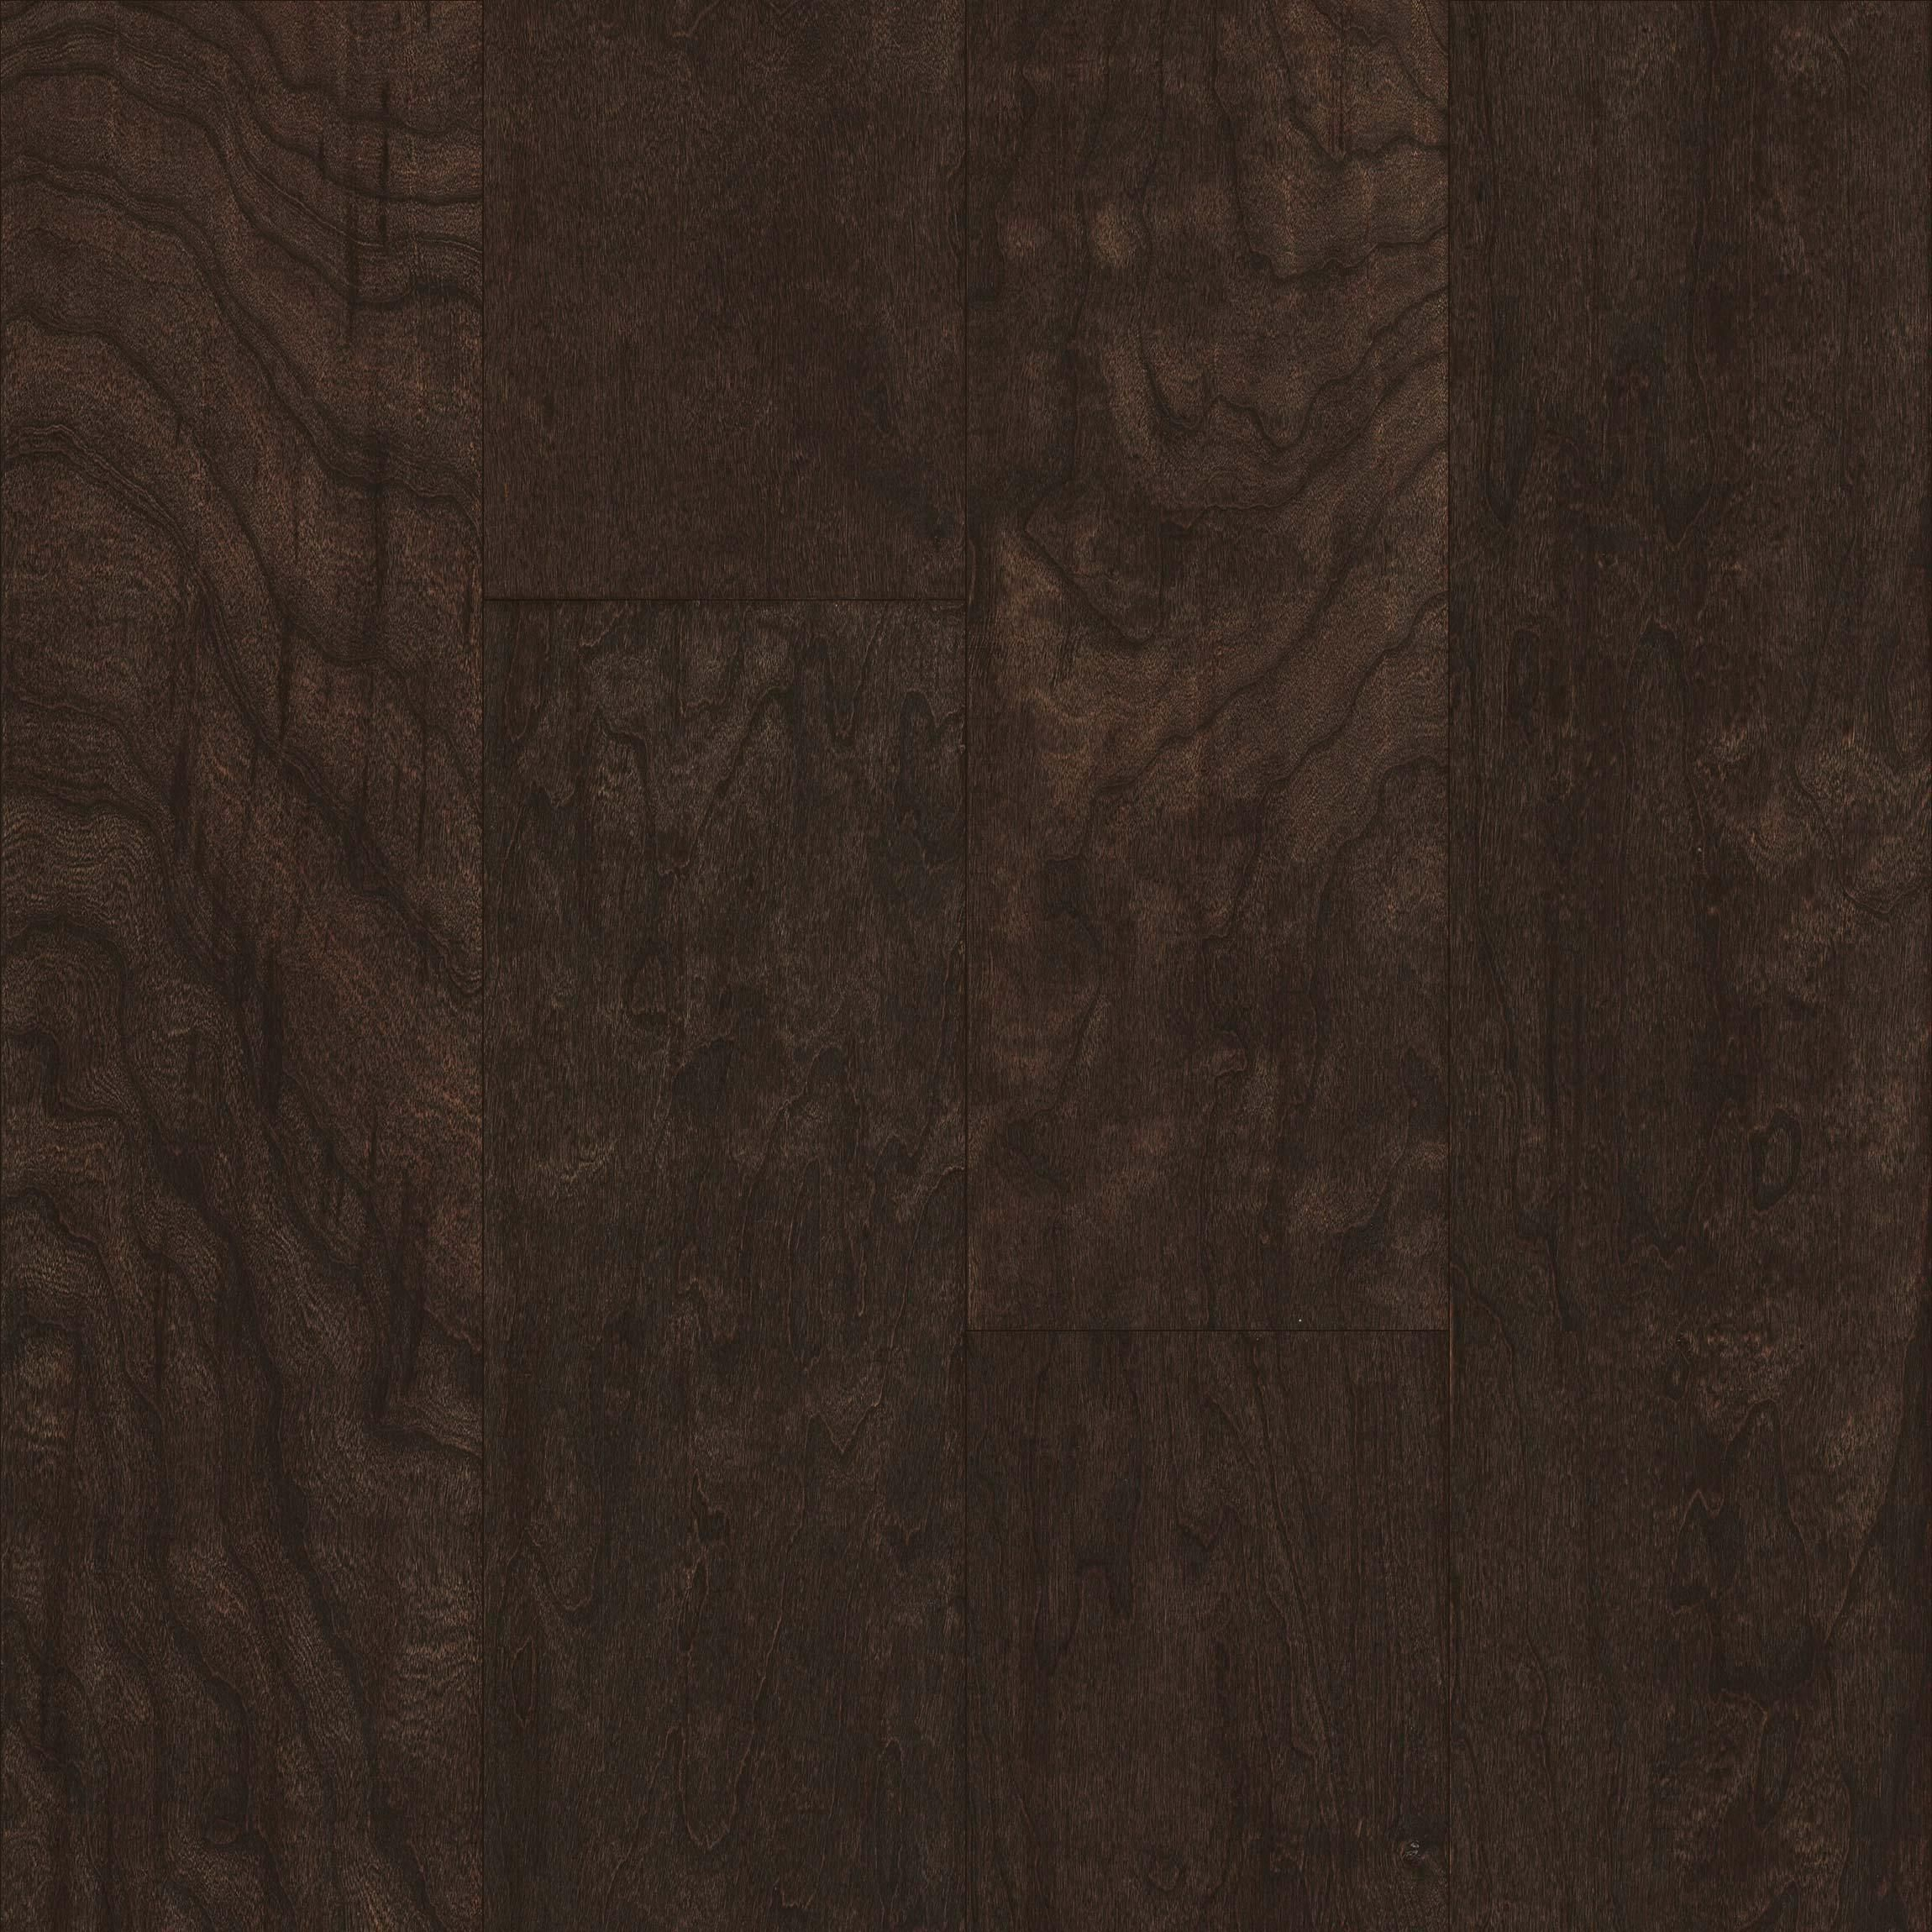 Armstrong American Scrape Premium Engineered Homestead Cherry 5 3 4 X 1 2 Hardwood Eas610 Interior Design Plan Hardwood Scrapes